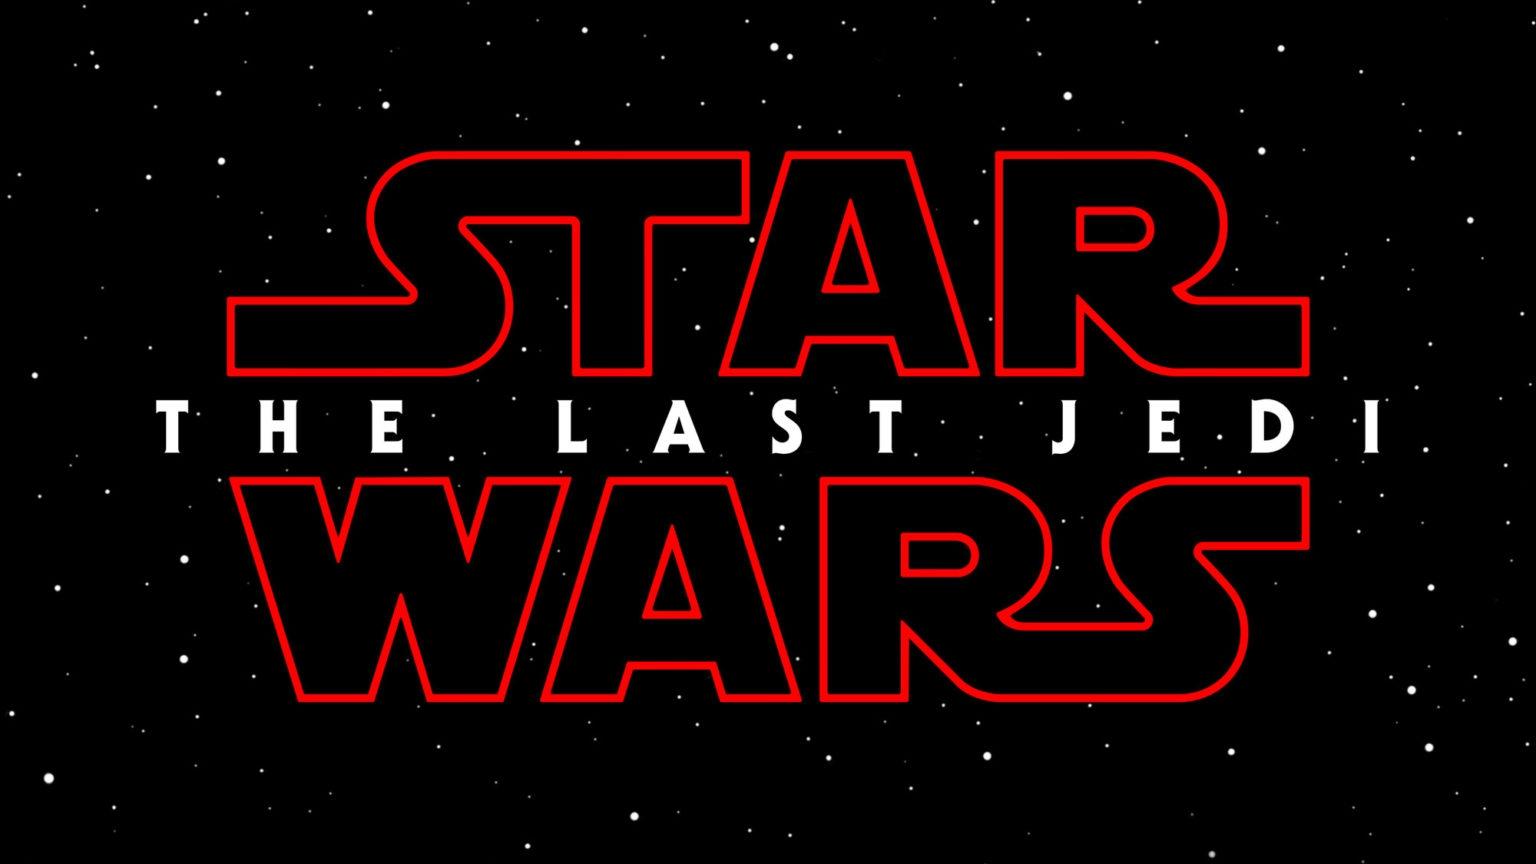 star-wars-the-last-jedi-disney-episode-viii